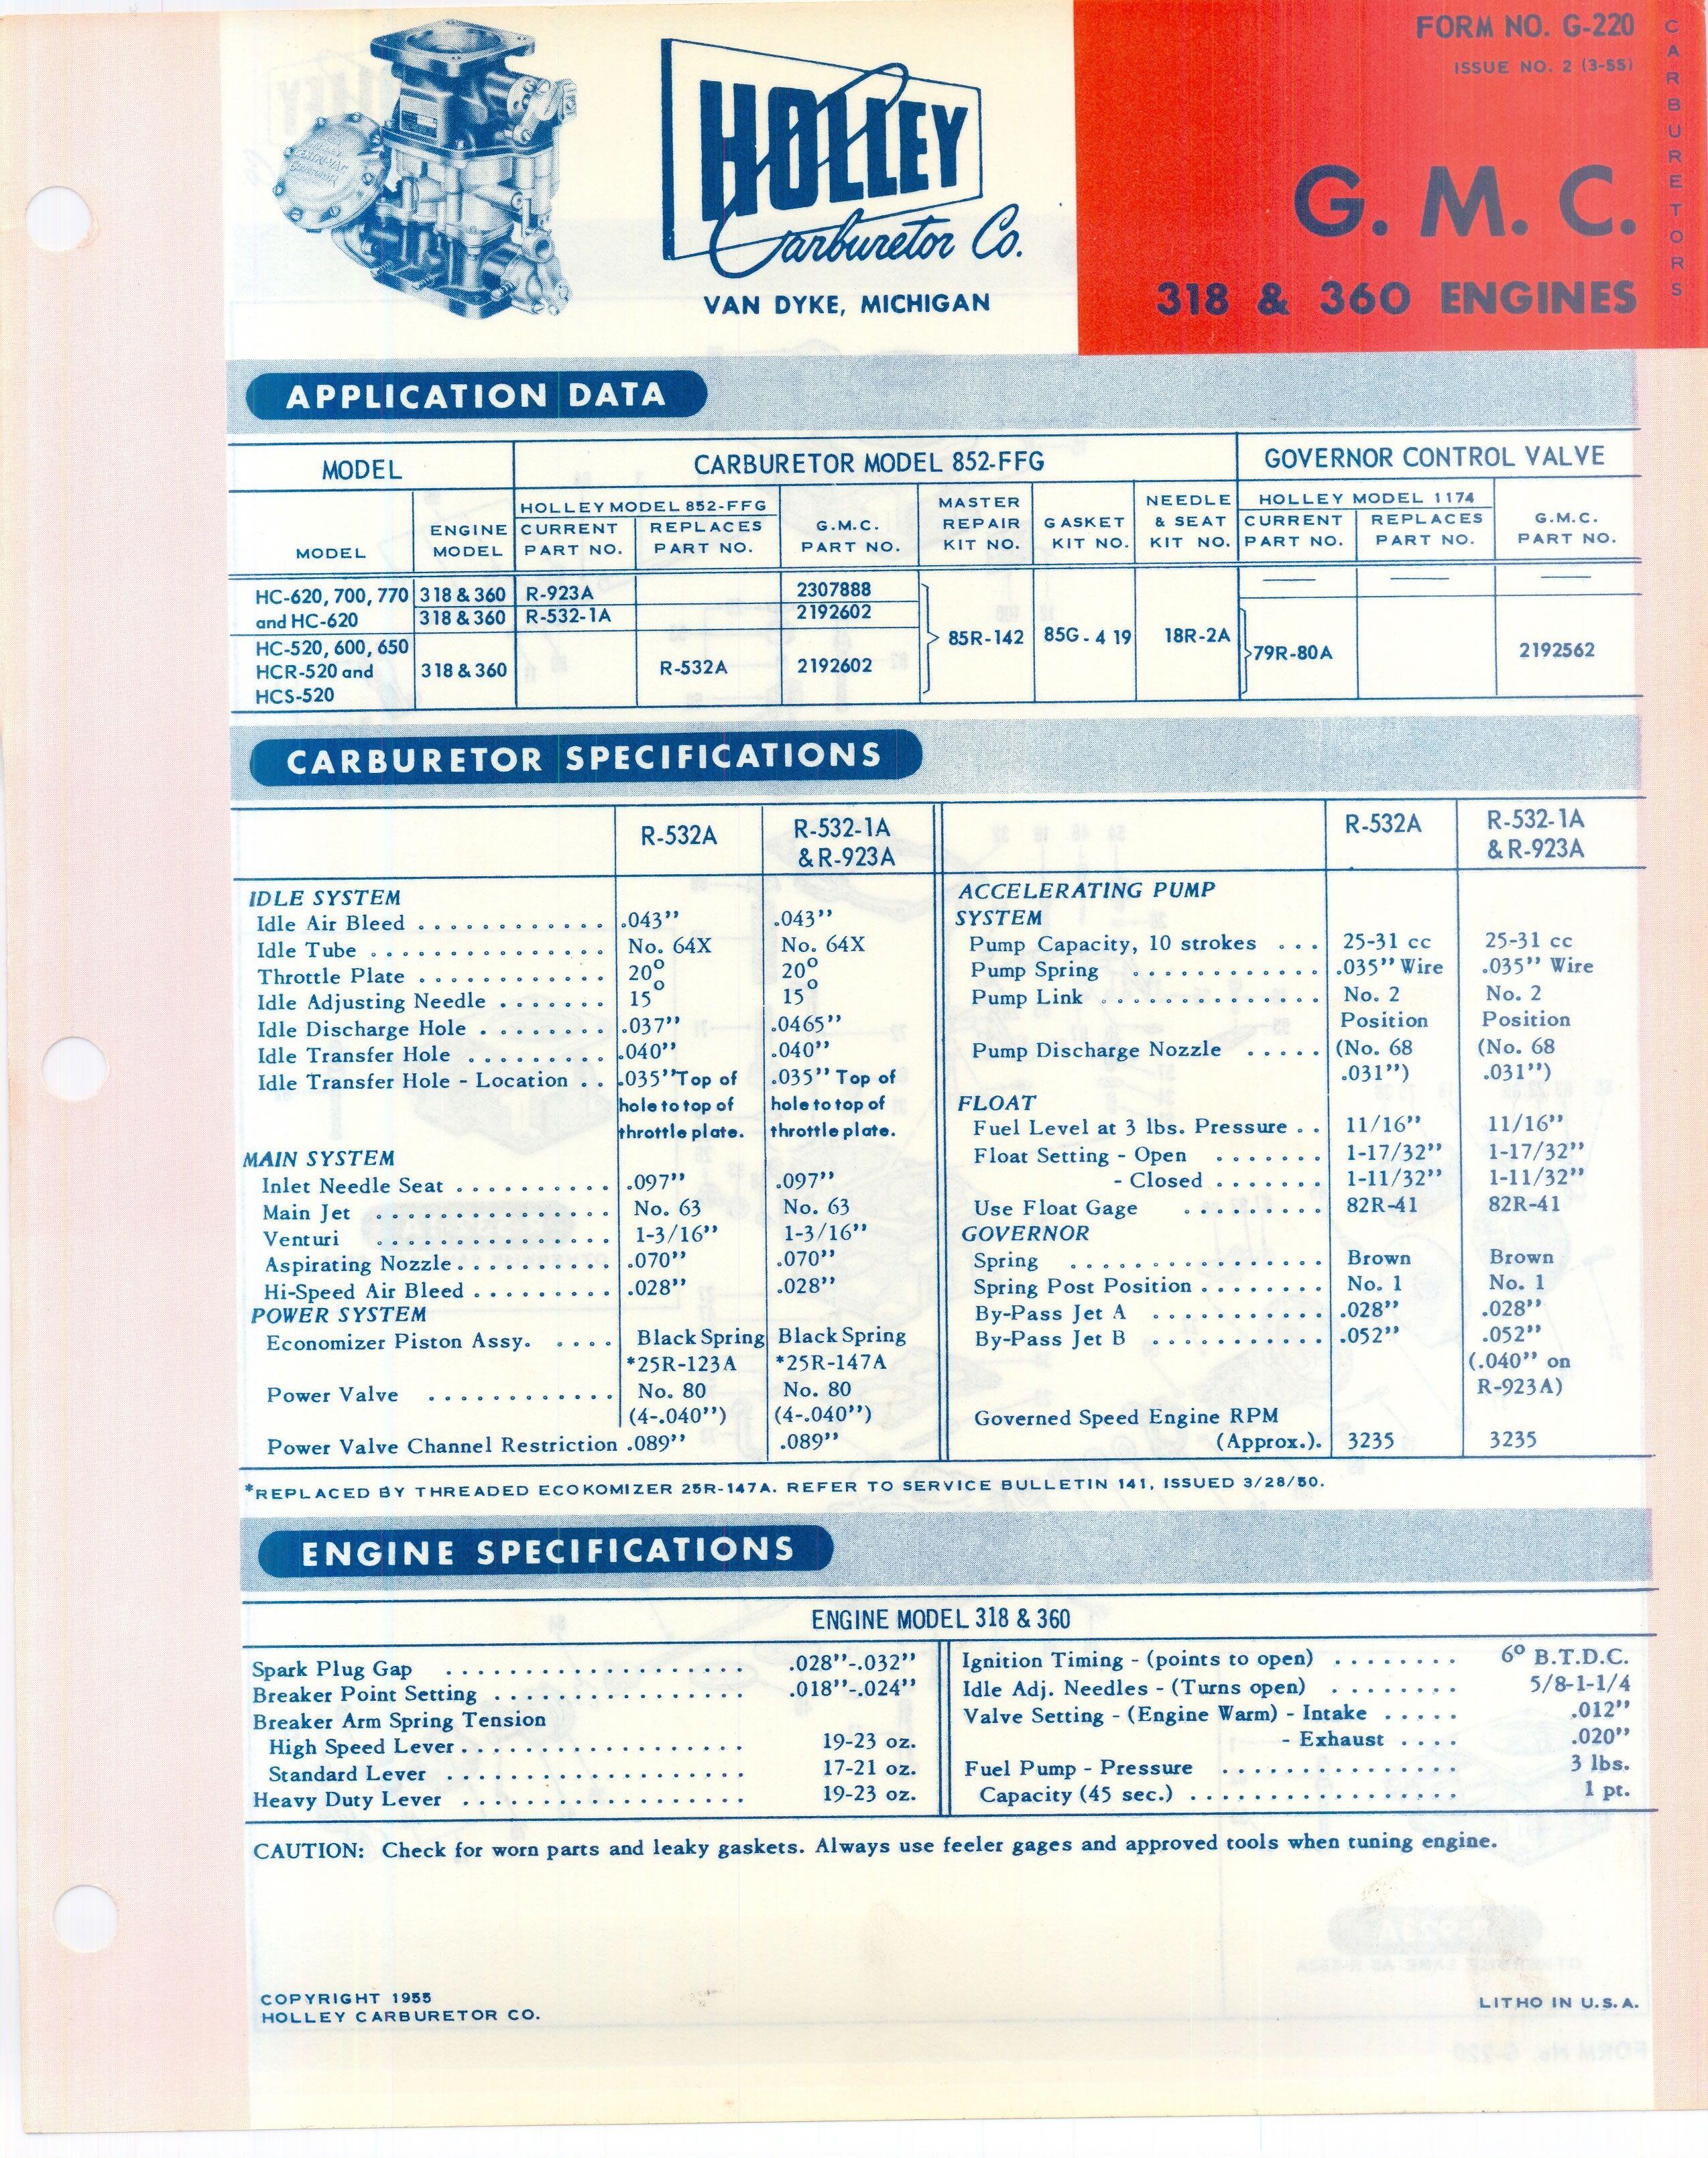 1950 S Holley Carbs For Gmc Gmcinfosheets0003 Jpg Gmc Control